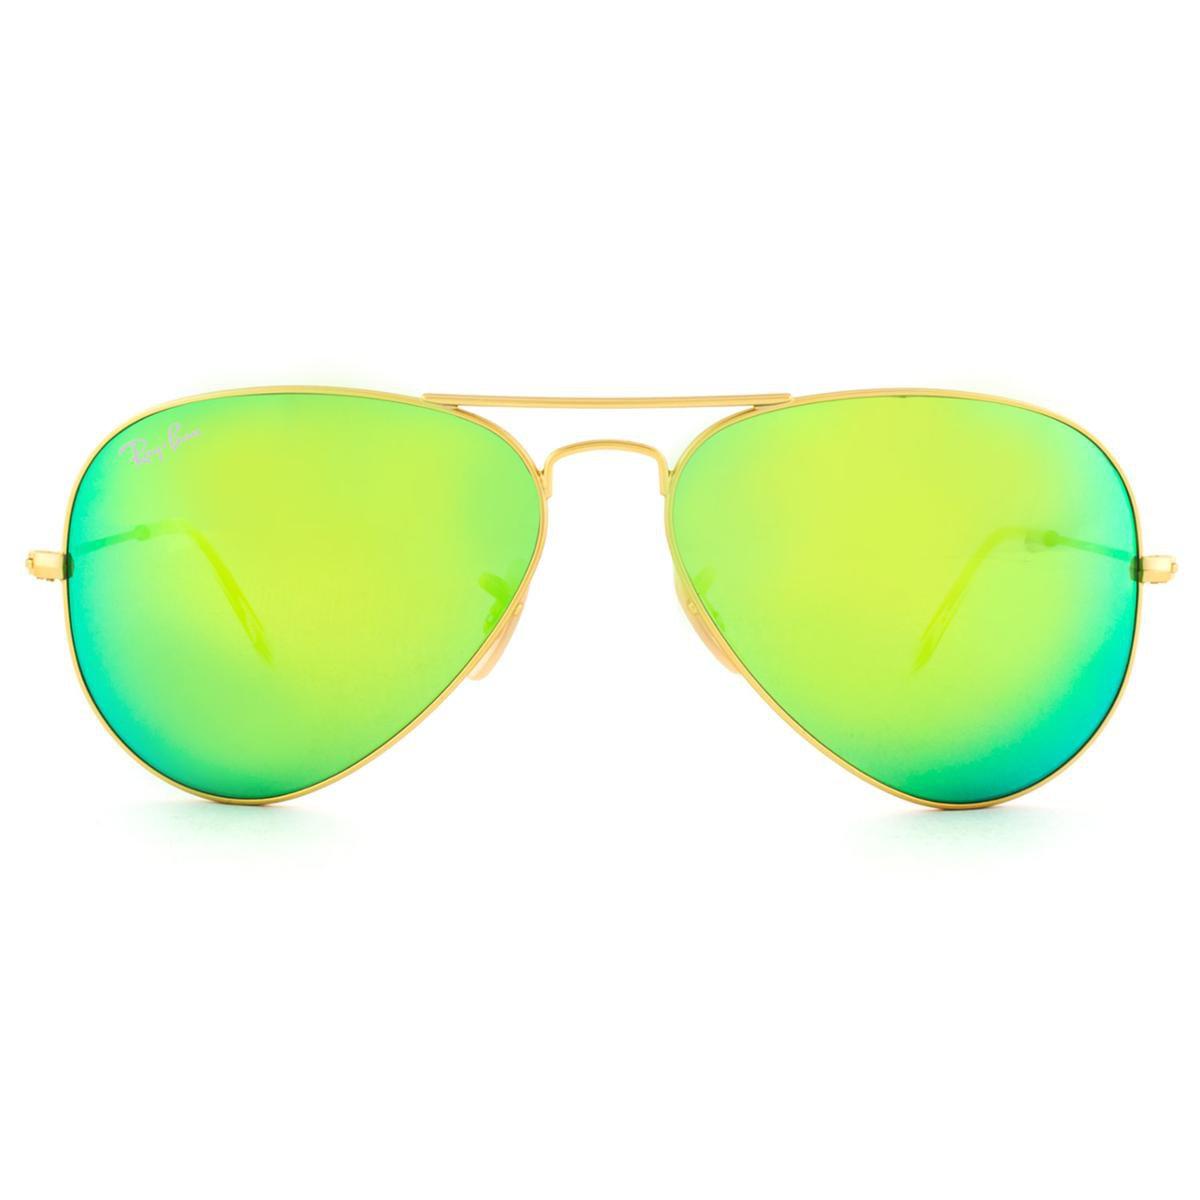 Óculos de Sol Ray Ban Aviador RB3025L 112 19-58 Masculino - Compre Agora    Netshoes 3aa1ebde87